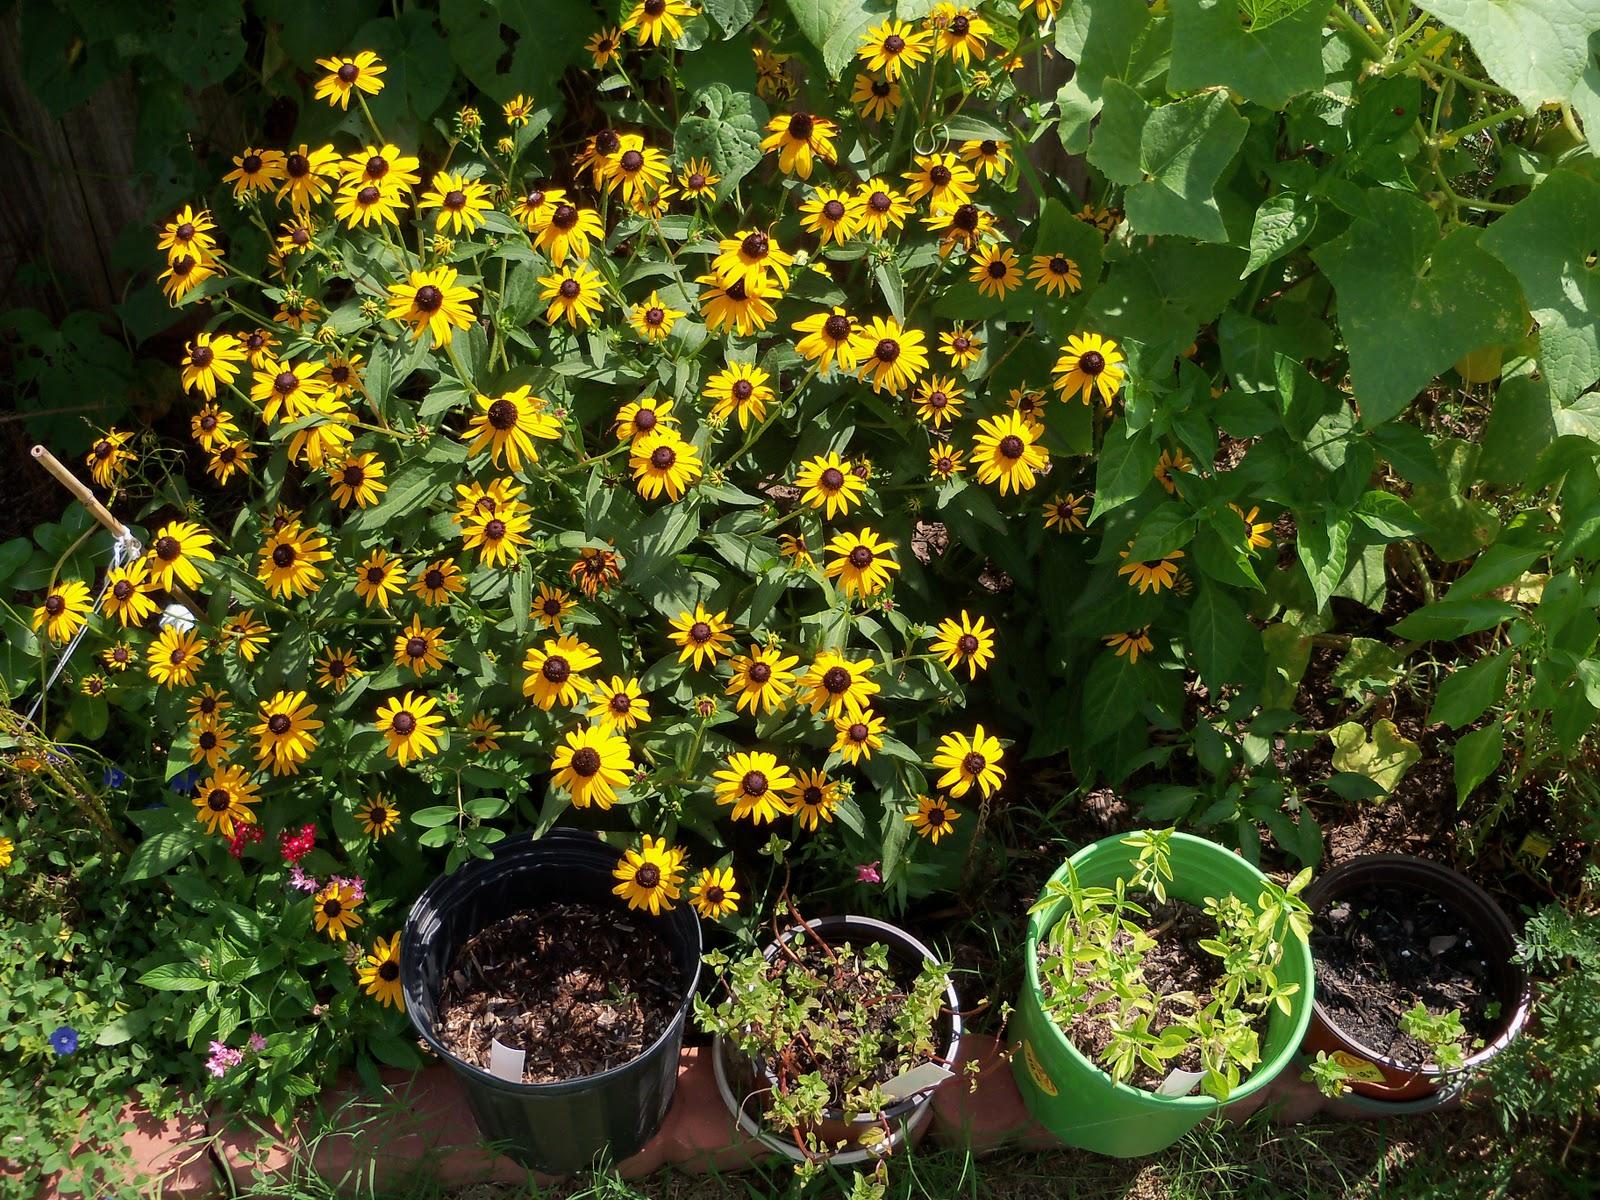 Gardening 2010, Part Three - 101_5105.JPG